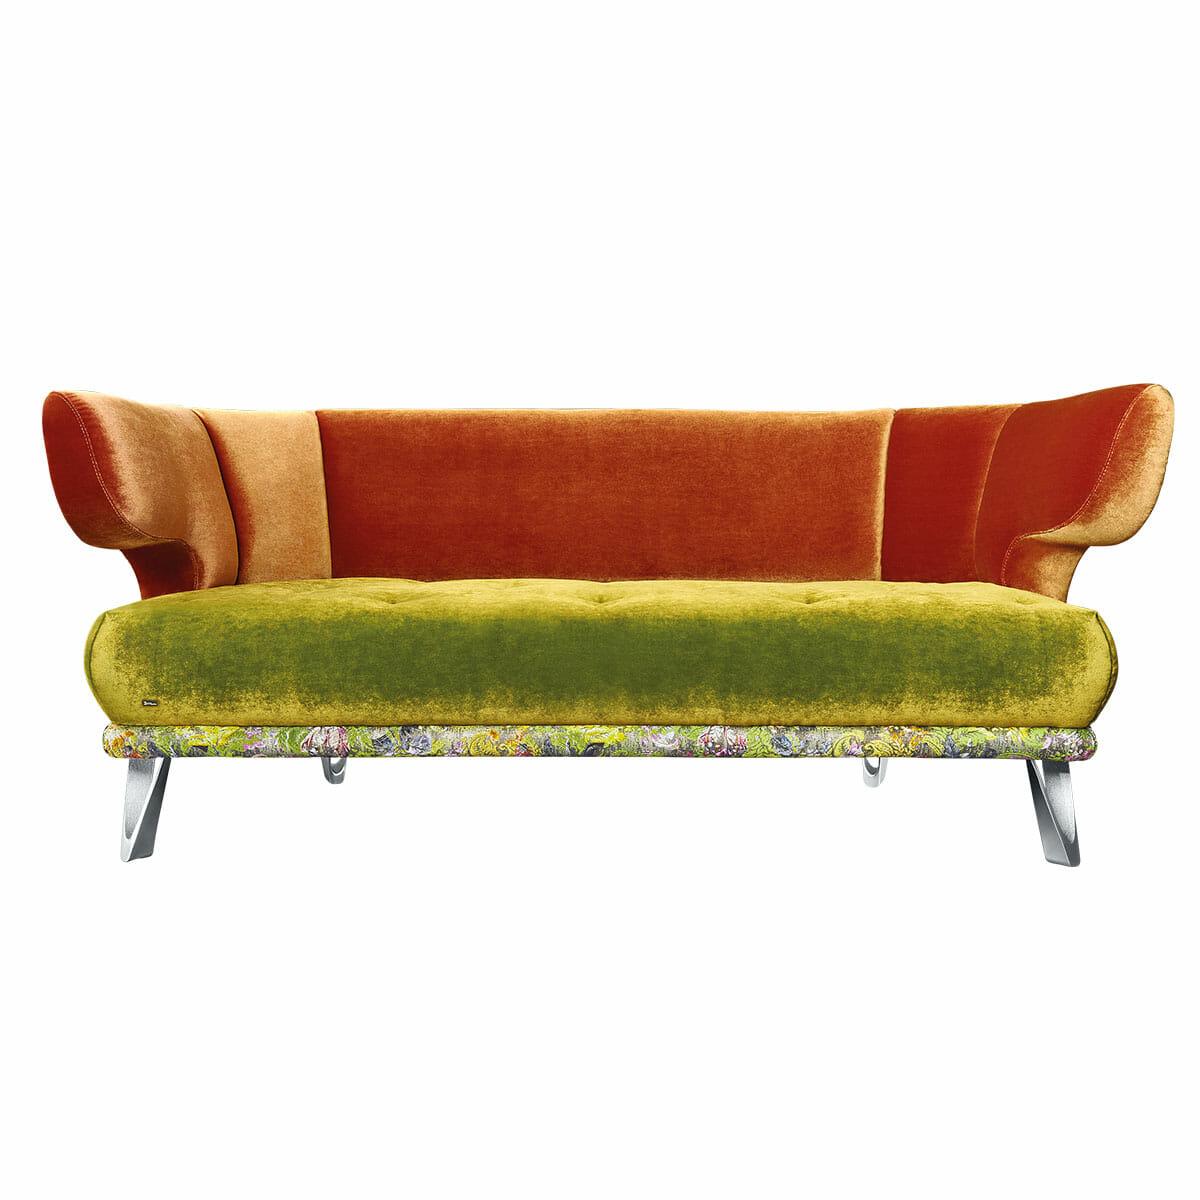 croissant by bretz top angebot an bretz croissant sofas. Black Bedroom Furniture Sets. Home Design Ideas